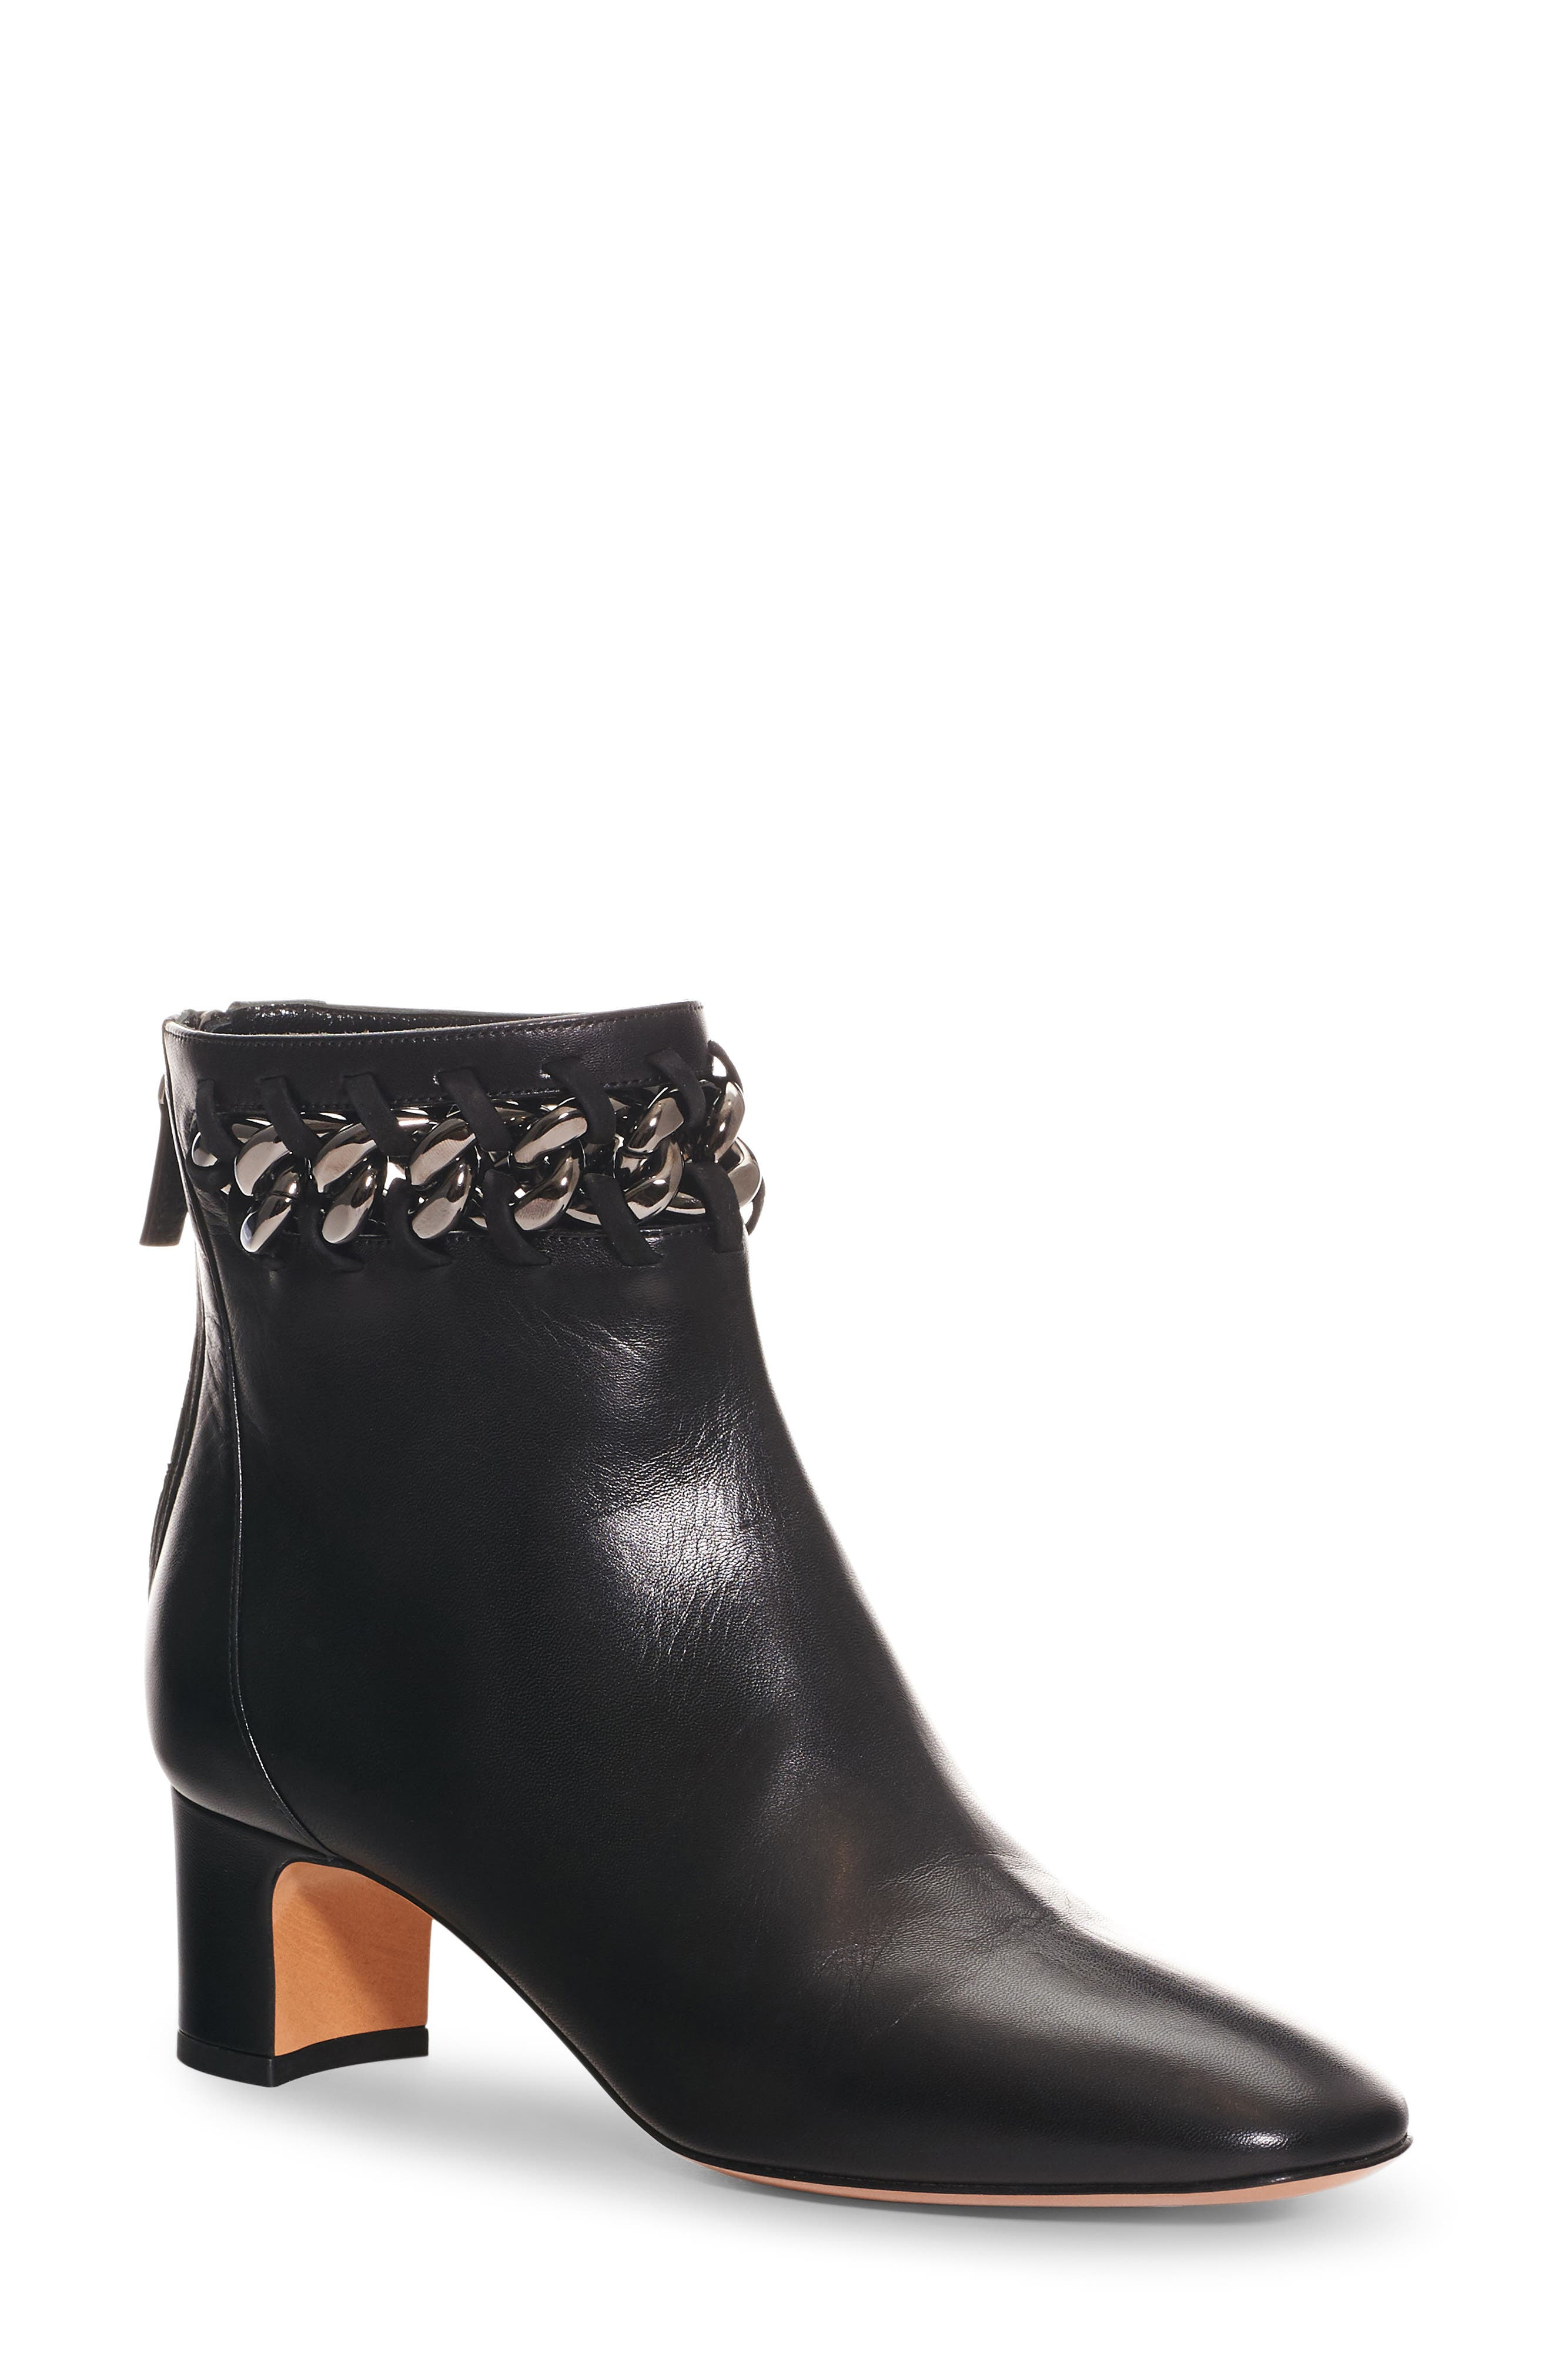 Main Image - VALENTINO GARAVANI Chain Woven Bootie (Women)